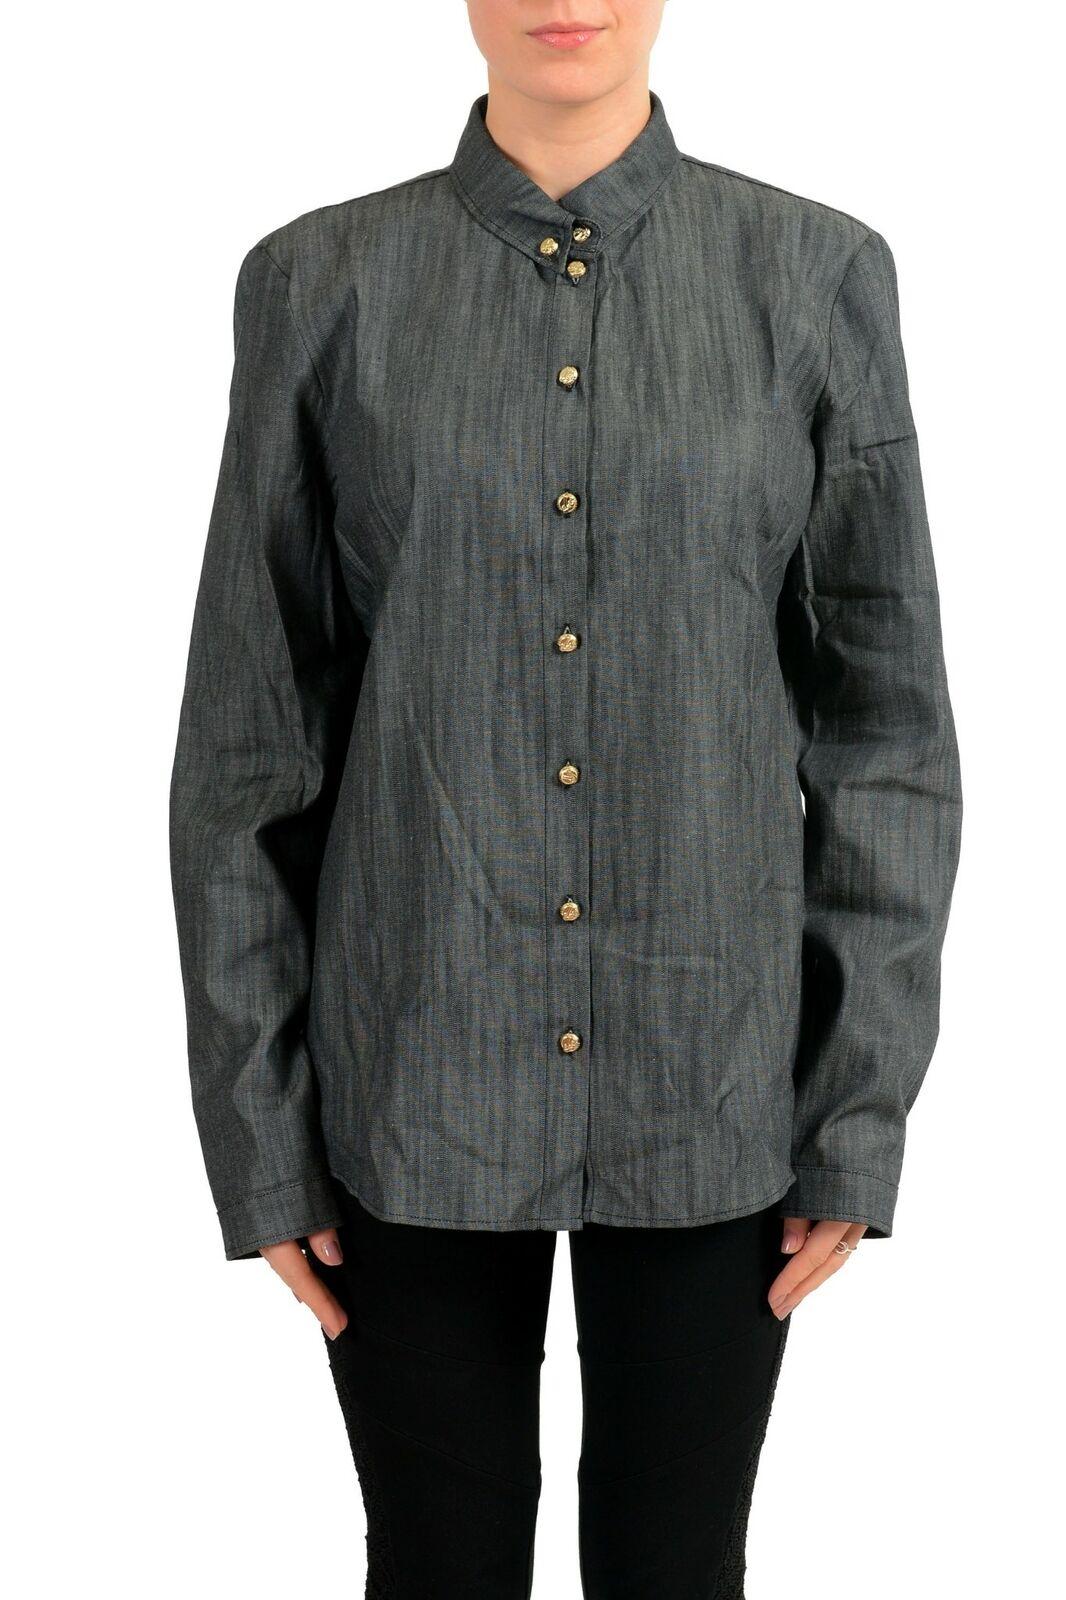 Versace Jeans Grau Knöpfe Denim Damen Shirt Größe L XL 2XL